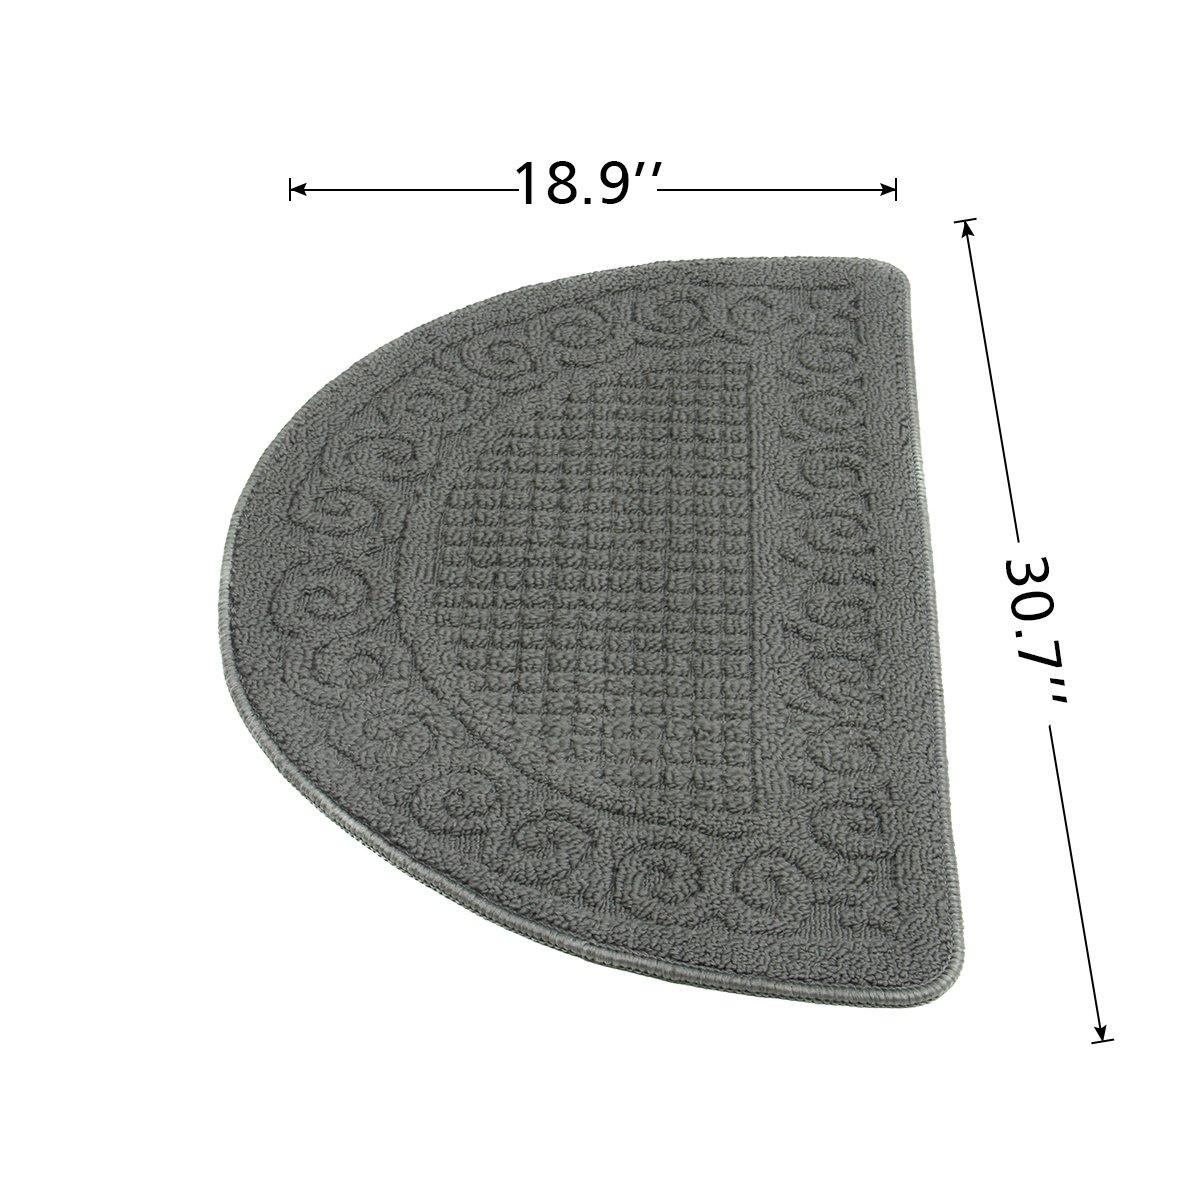 YOUKADA Waterhog Fashion Diamond Polypropylene Fiber Entrance Indoor Floor Mat, SBR Rubber Backing, 31\